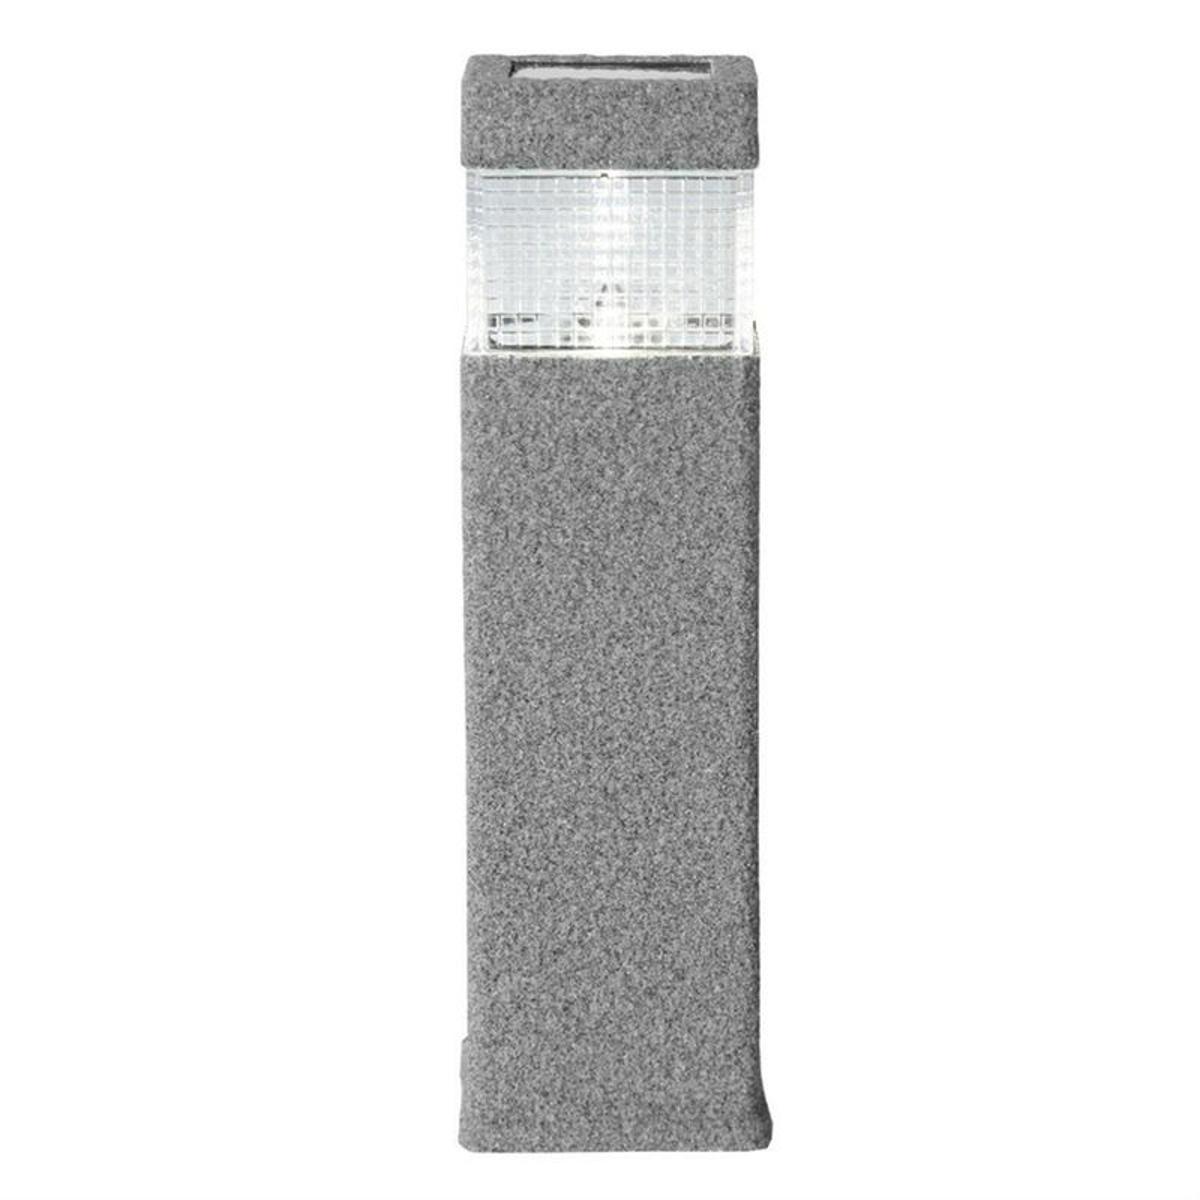 borne solaire malibu 300 lm gris inspire vendu par leroy. Black Bedroom Furniture Sets. Home Design Ideas